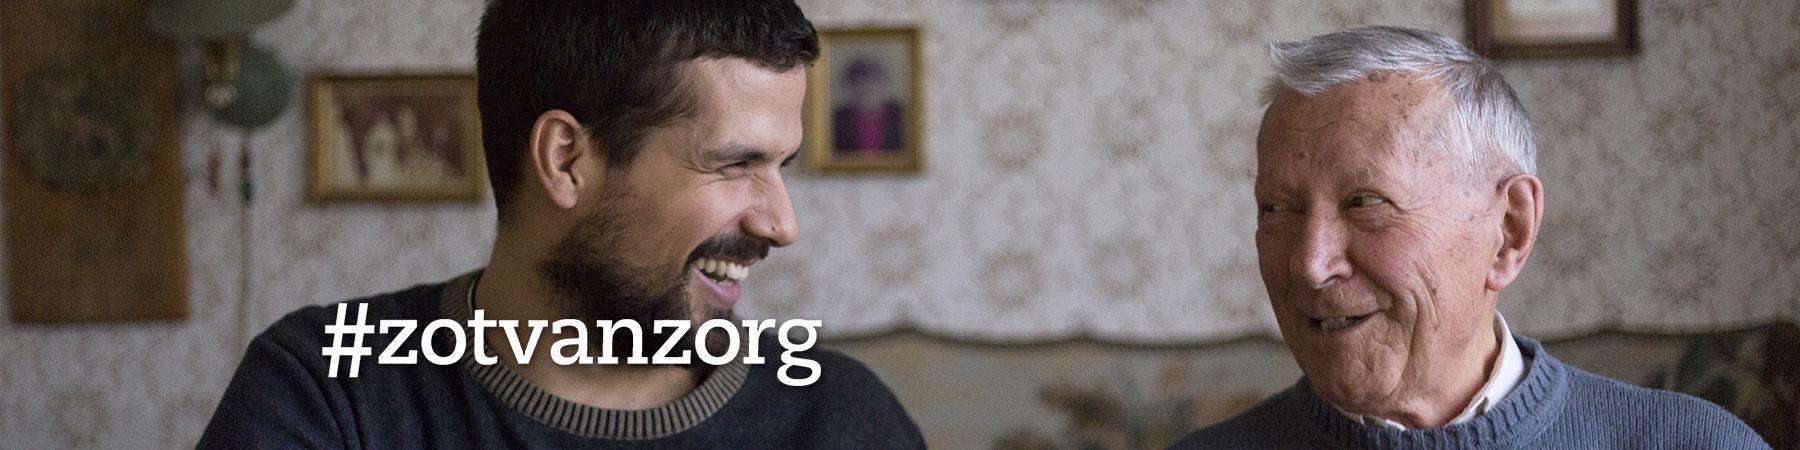 zotvanzorg_website_4_12.jpg